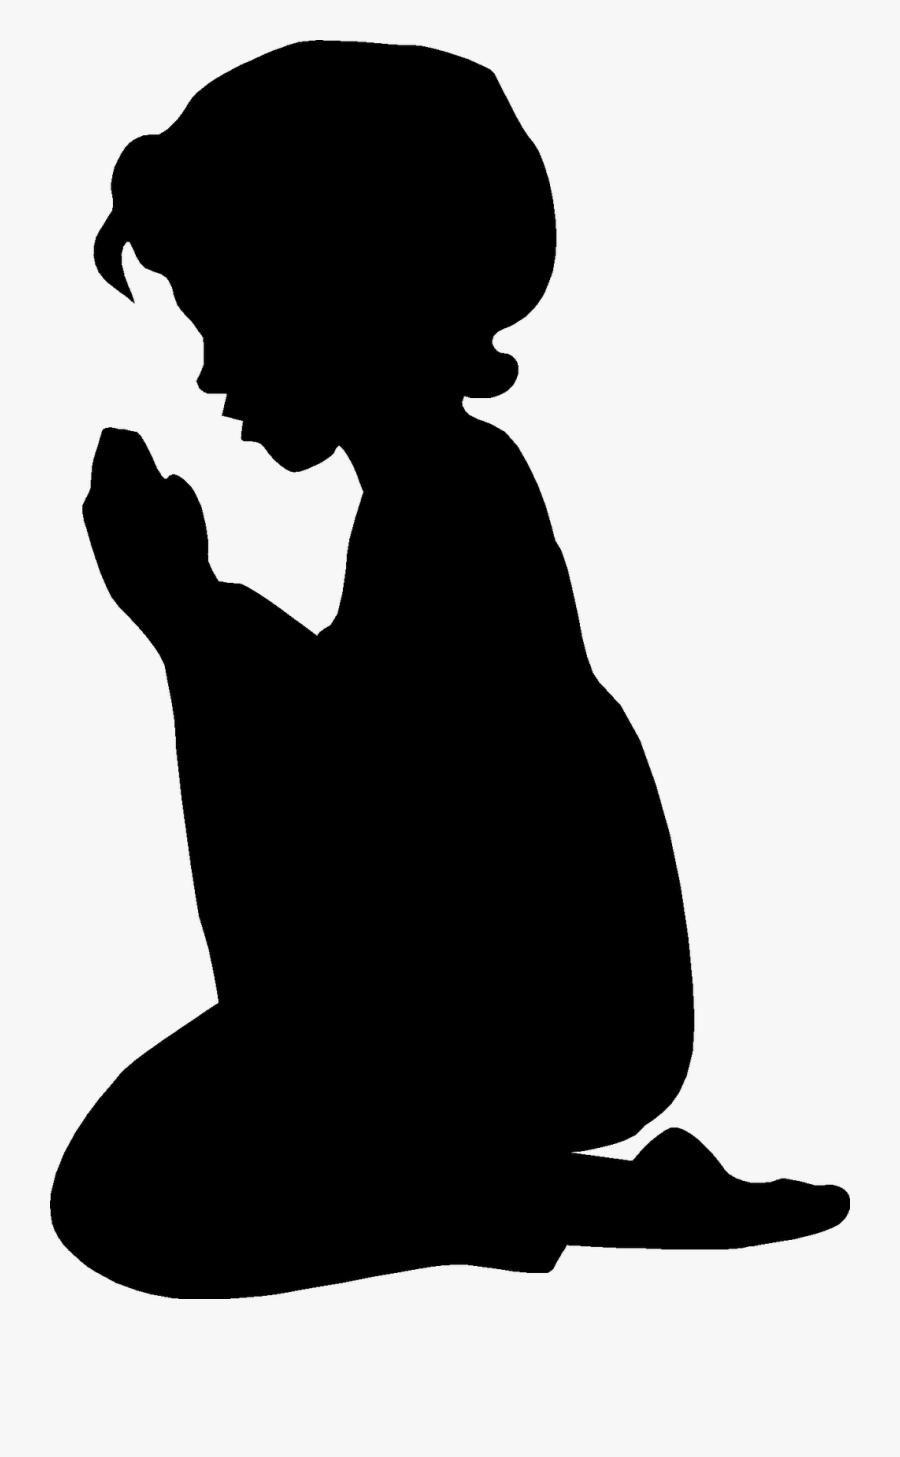 Kneeling Silhouette Clip Art - Child Praying , Free Transparent ...